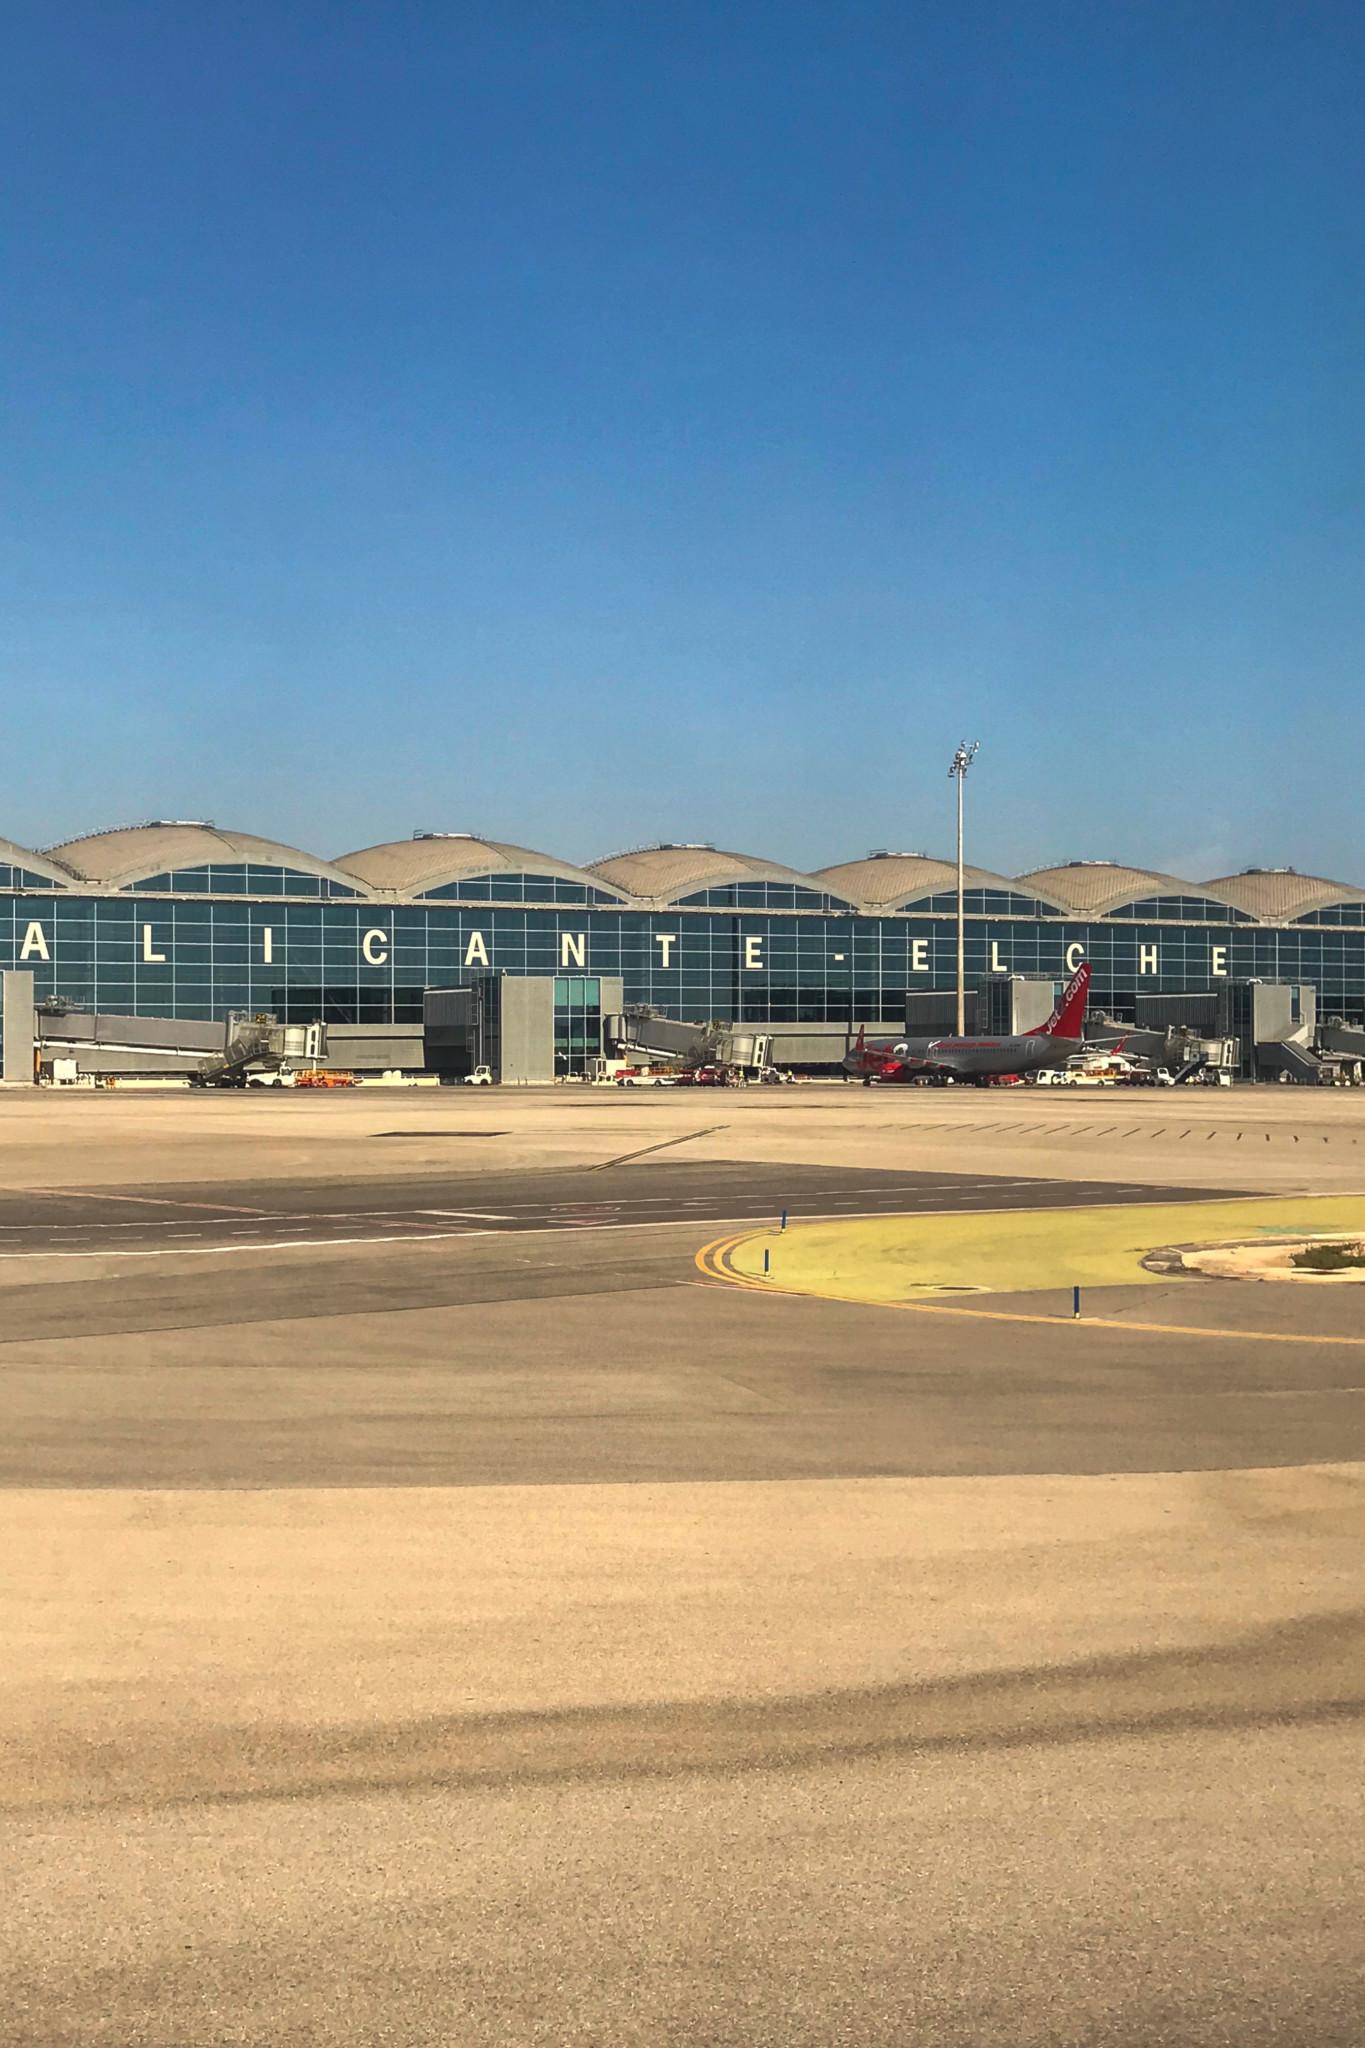 Alicante Flughafen